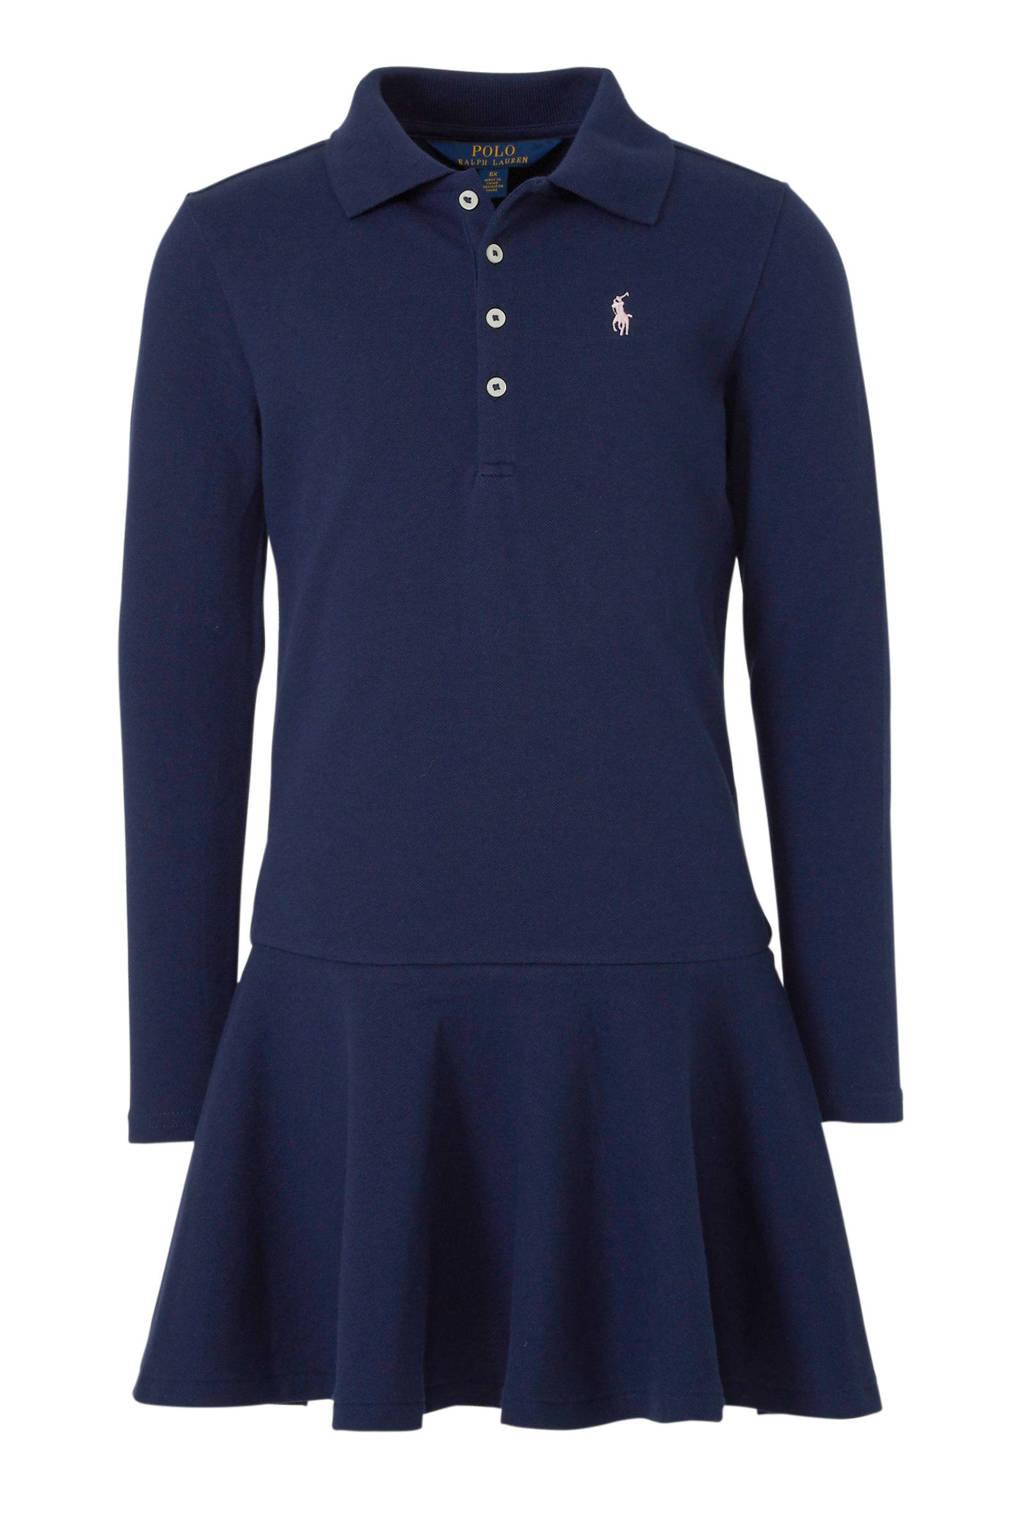 POLO Ralph Lauren jersey jurk met borduursels donkerblauw, Donkerblauw